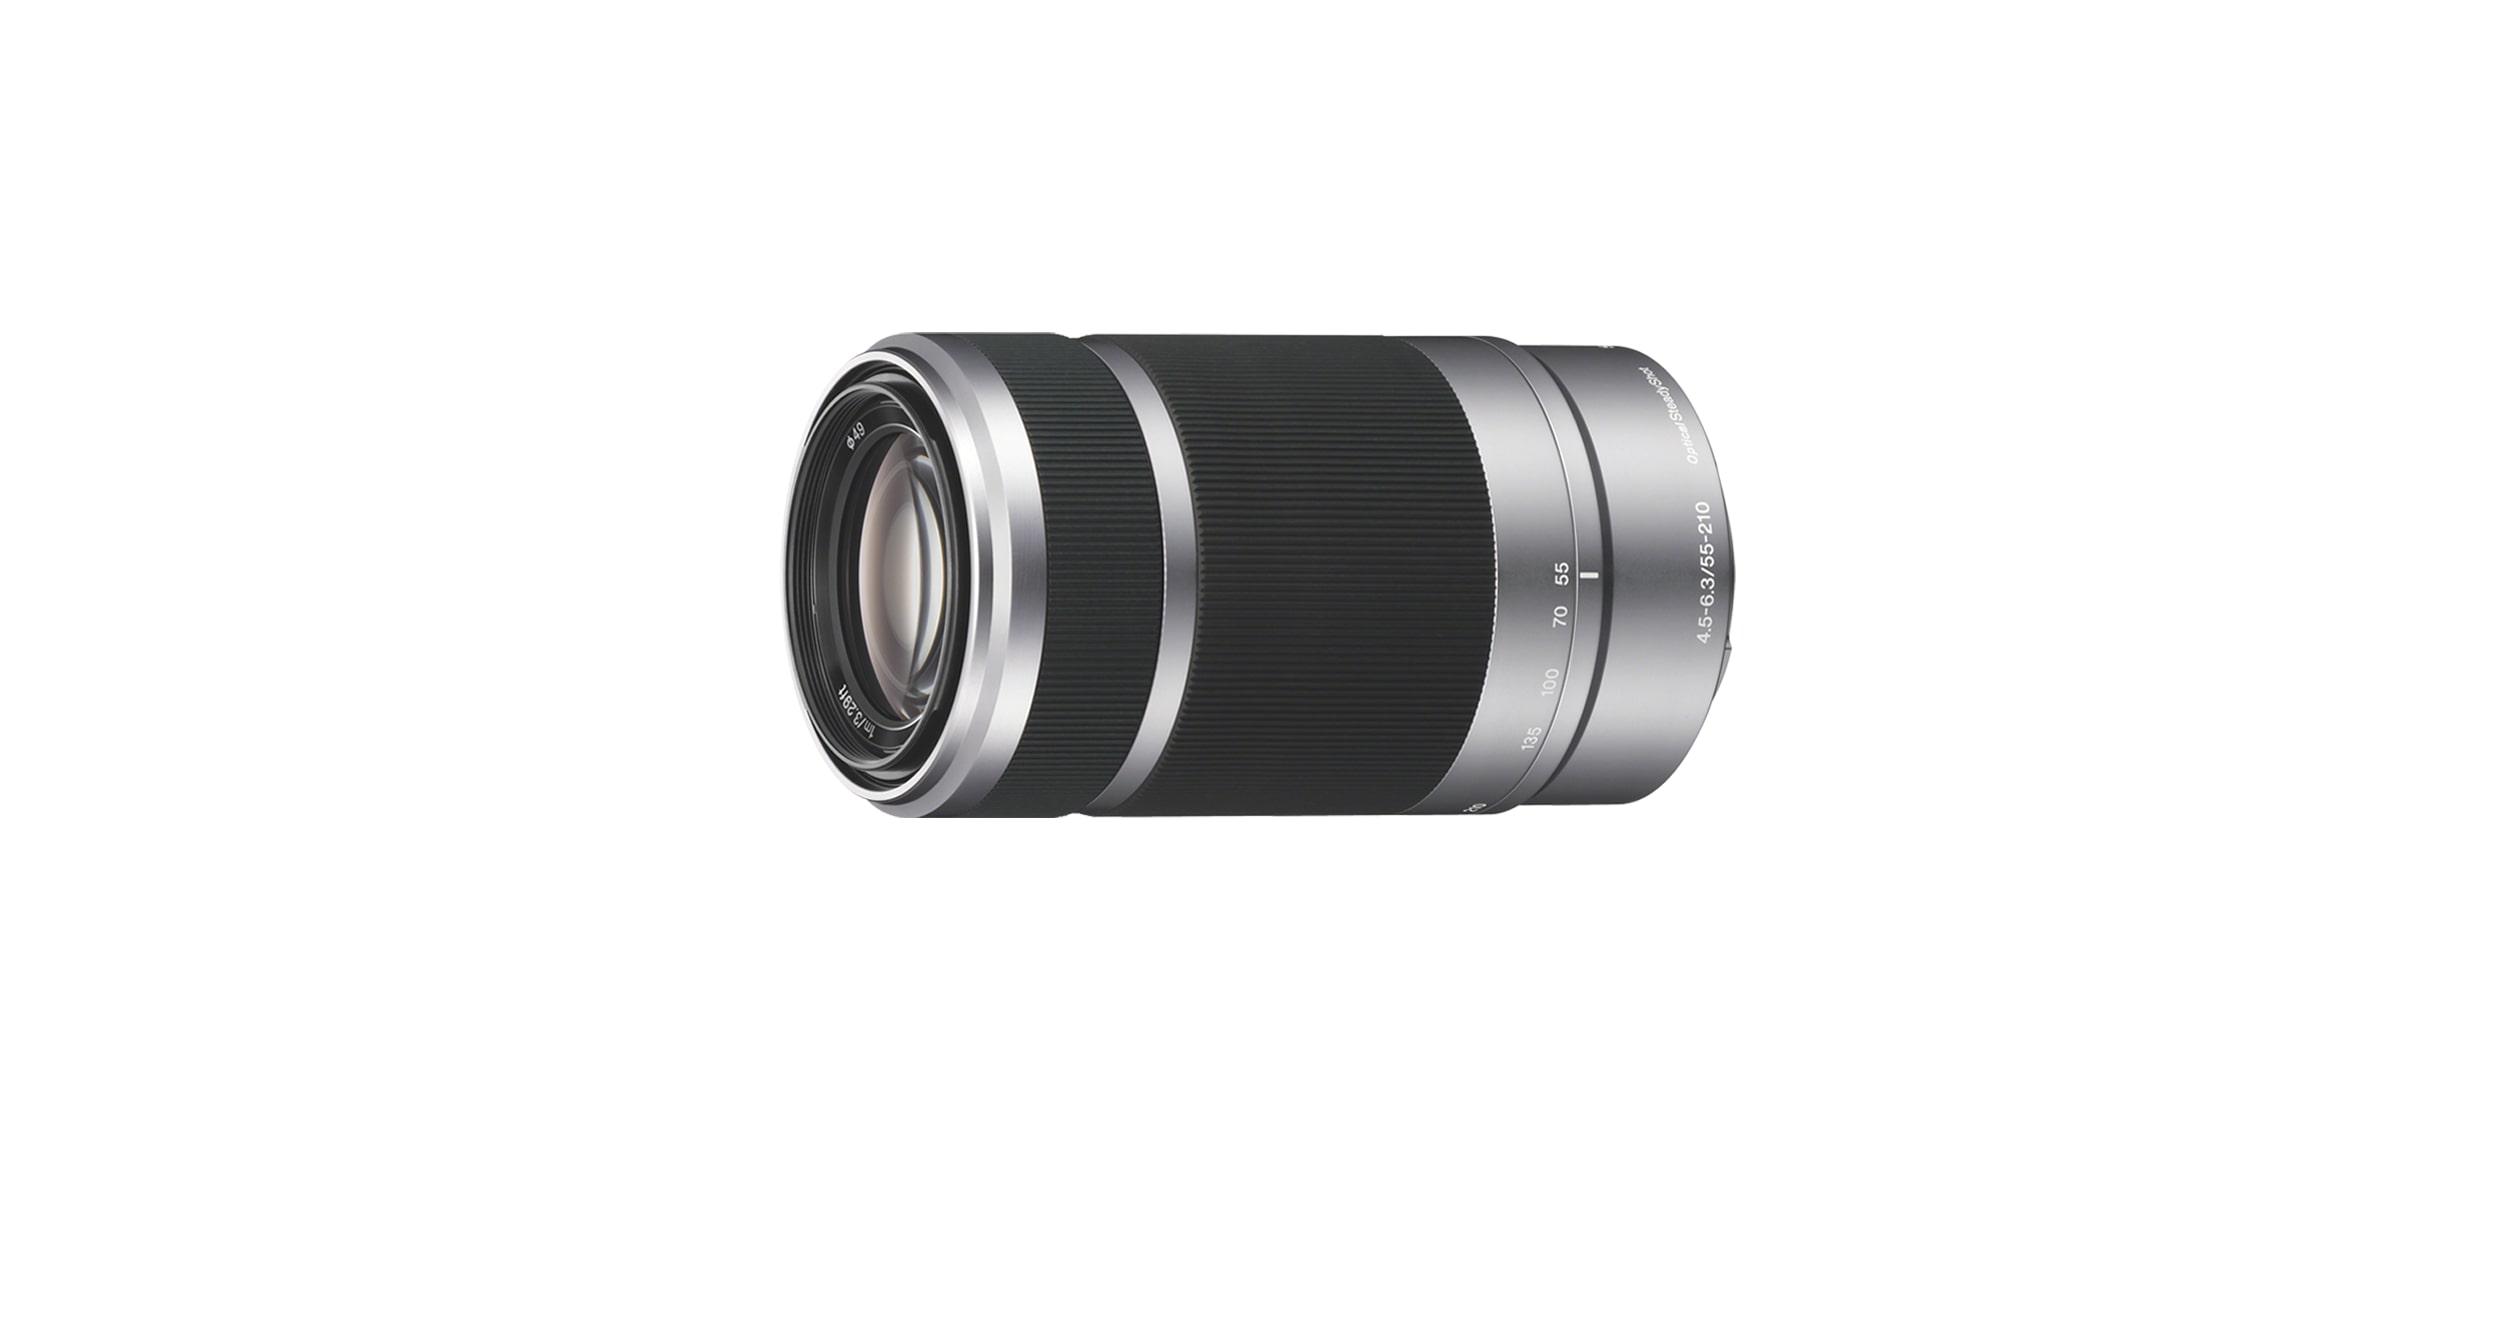 Sony E 55 210mm F5 Daftar Harga Terkini Dan Terlengkap Indonesia Lens Hood Et 54b Untuk Lensa Tele Canon Ef M 200mm F45 63 Is Stm Eos 55210